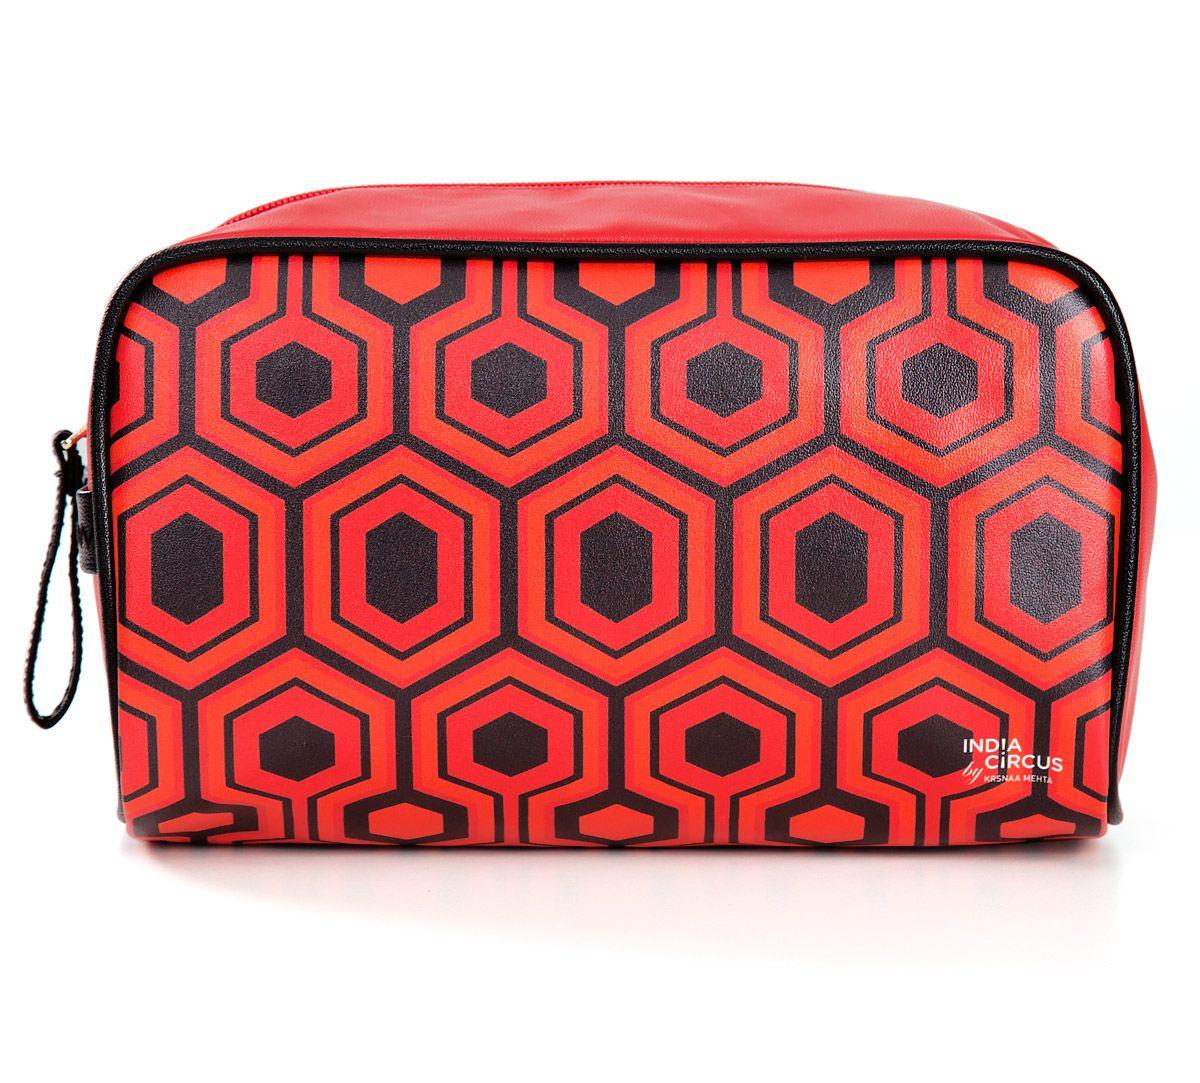 Prismatic Hexagons Travel Kit